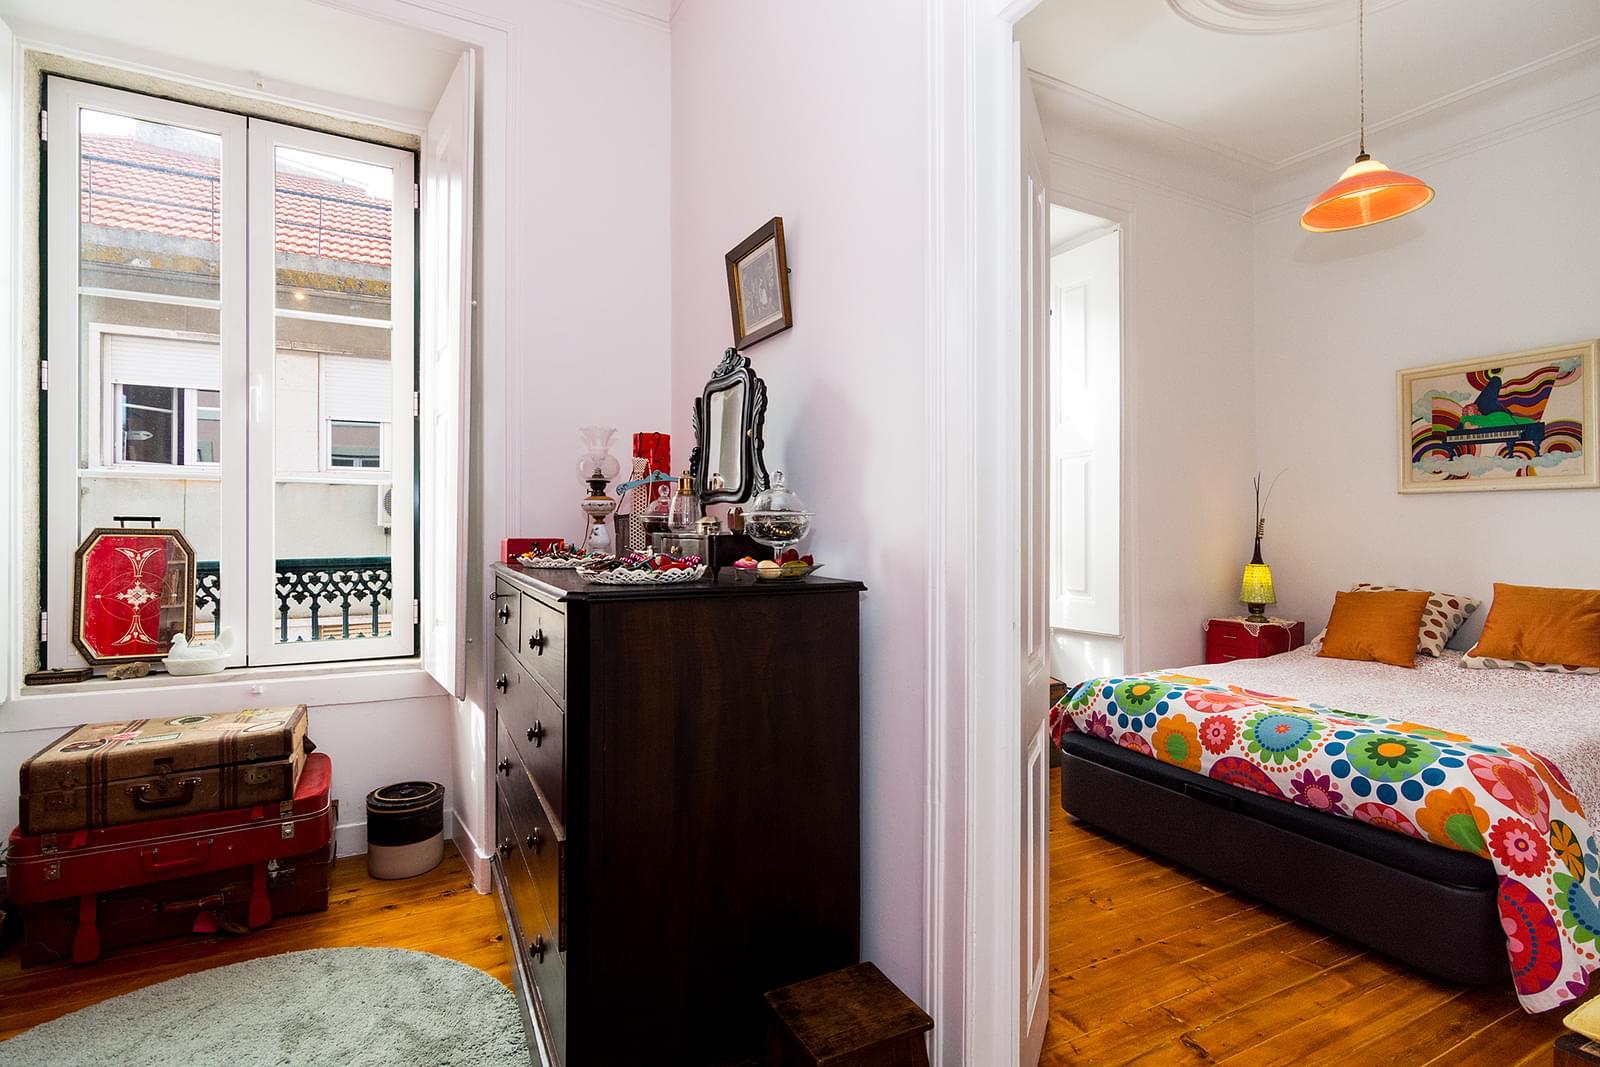 pf17497-apartamento-t3-lisboa-3188b40d-8abb-434a-84b8-e675a5f7692c